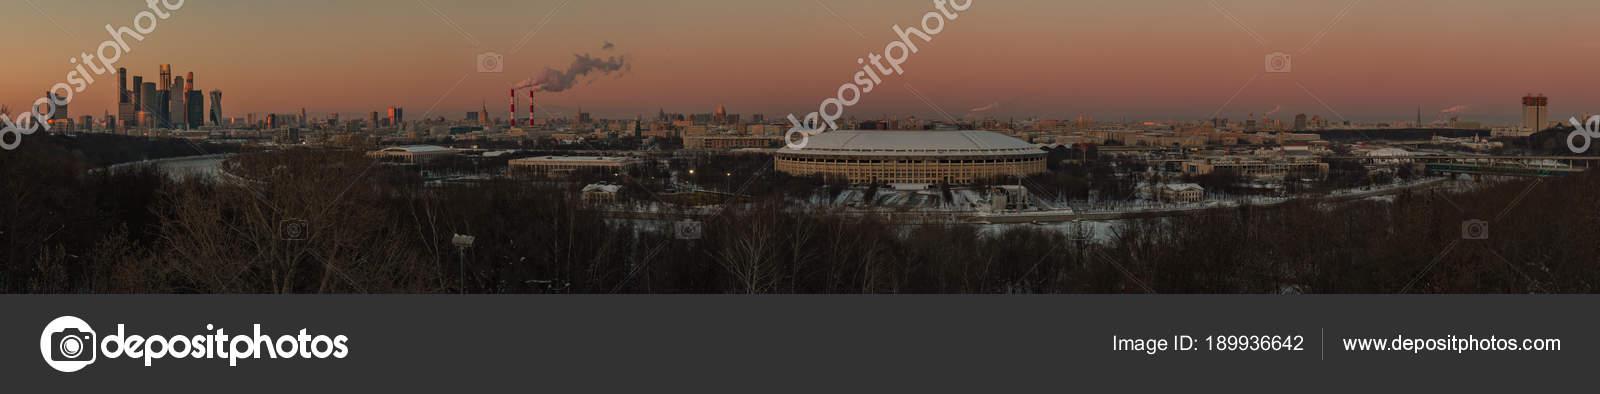 Moscow Panorama IV – Stock Editorial Photo © brunocoelhopt